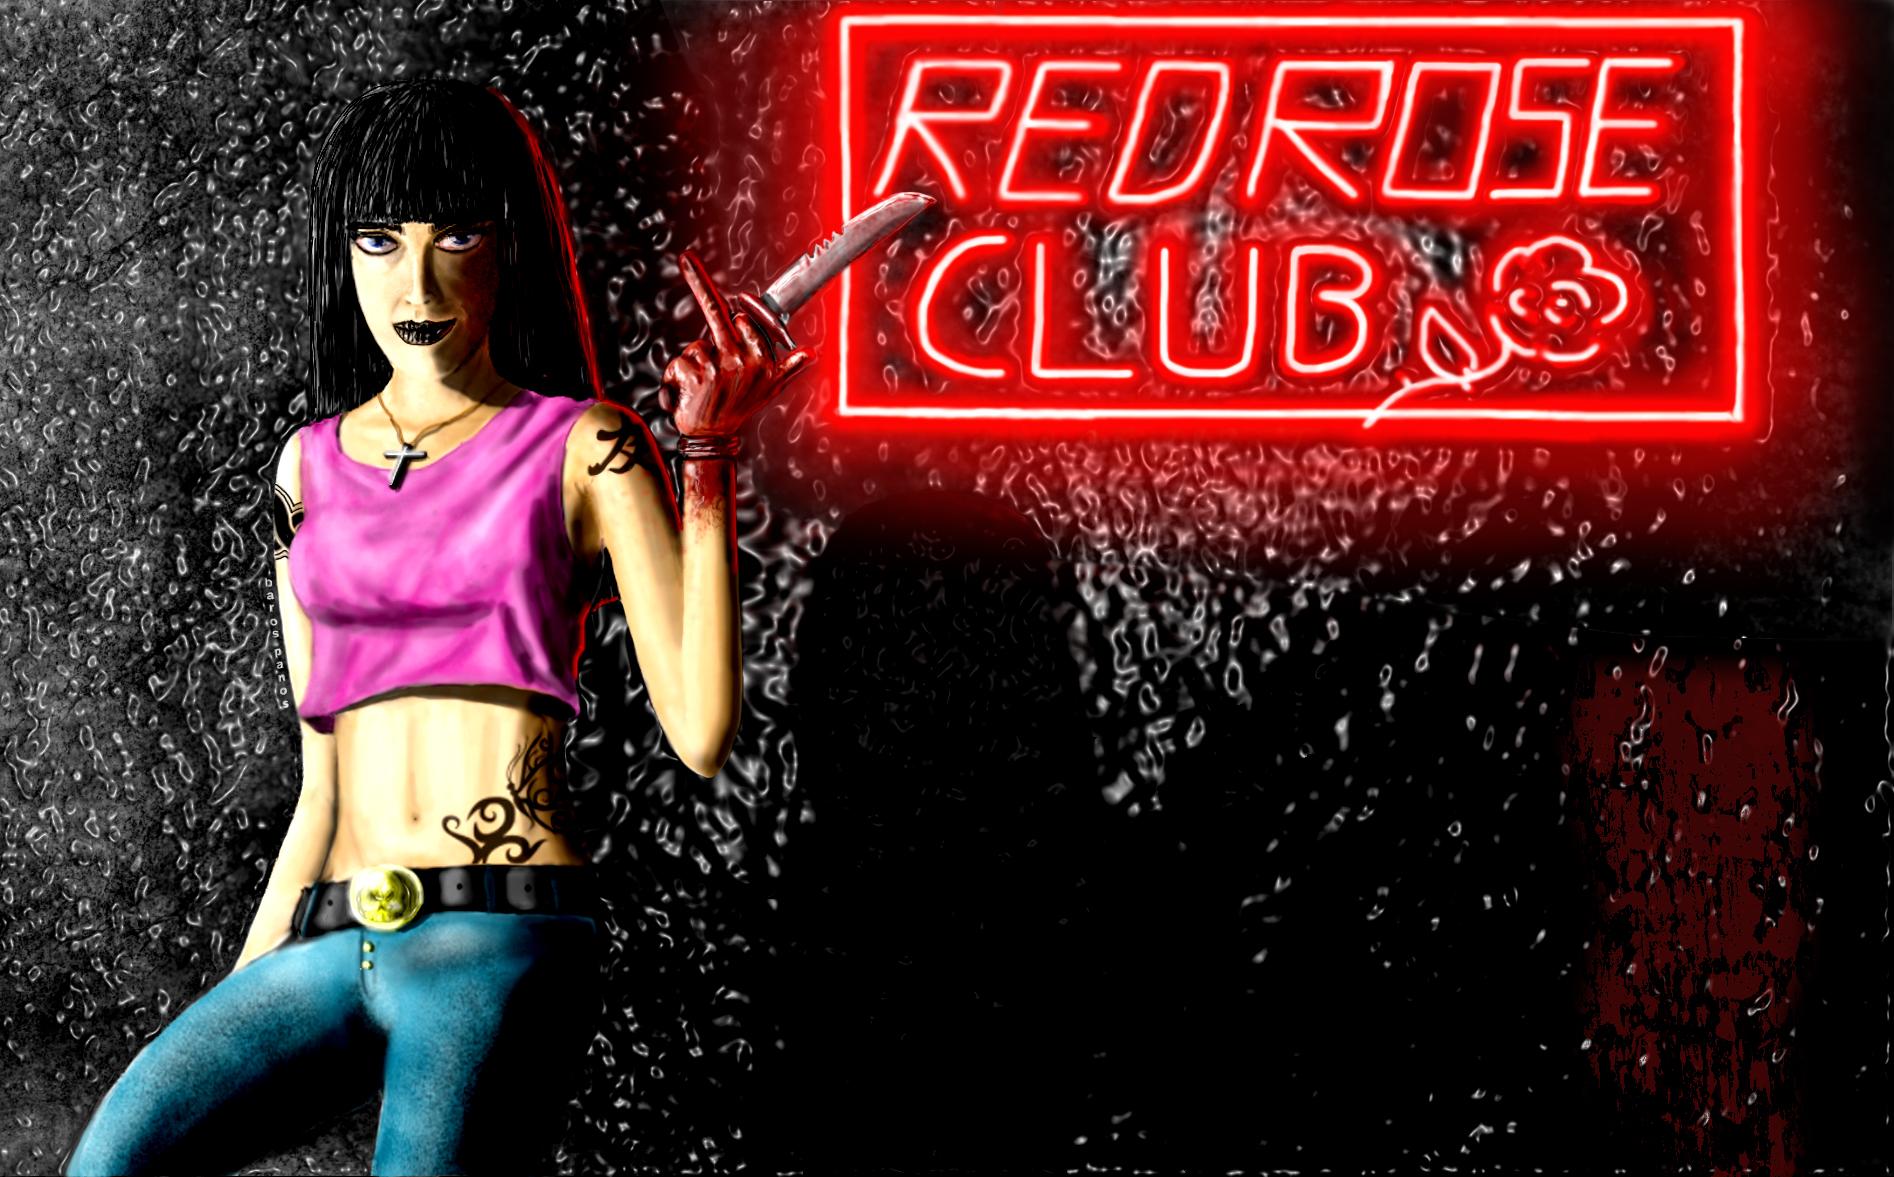 red rose club